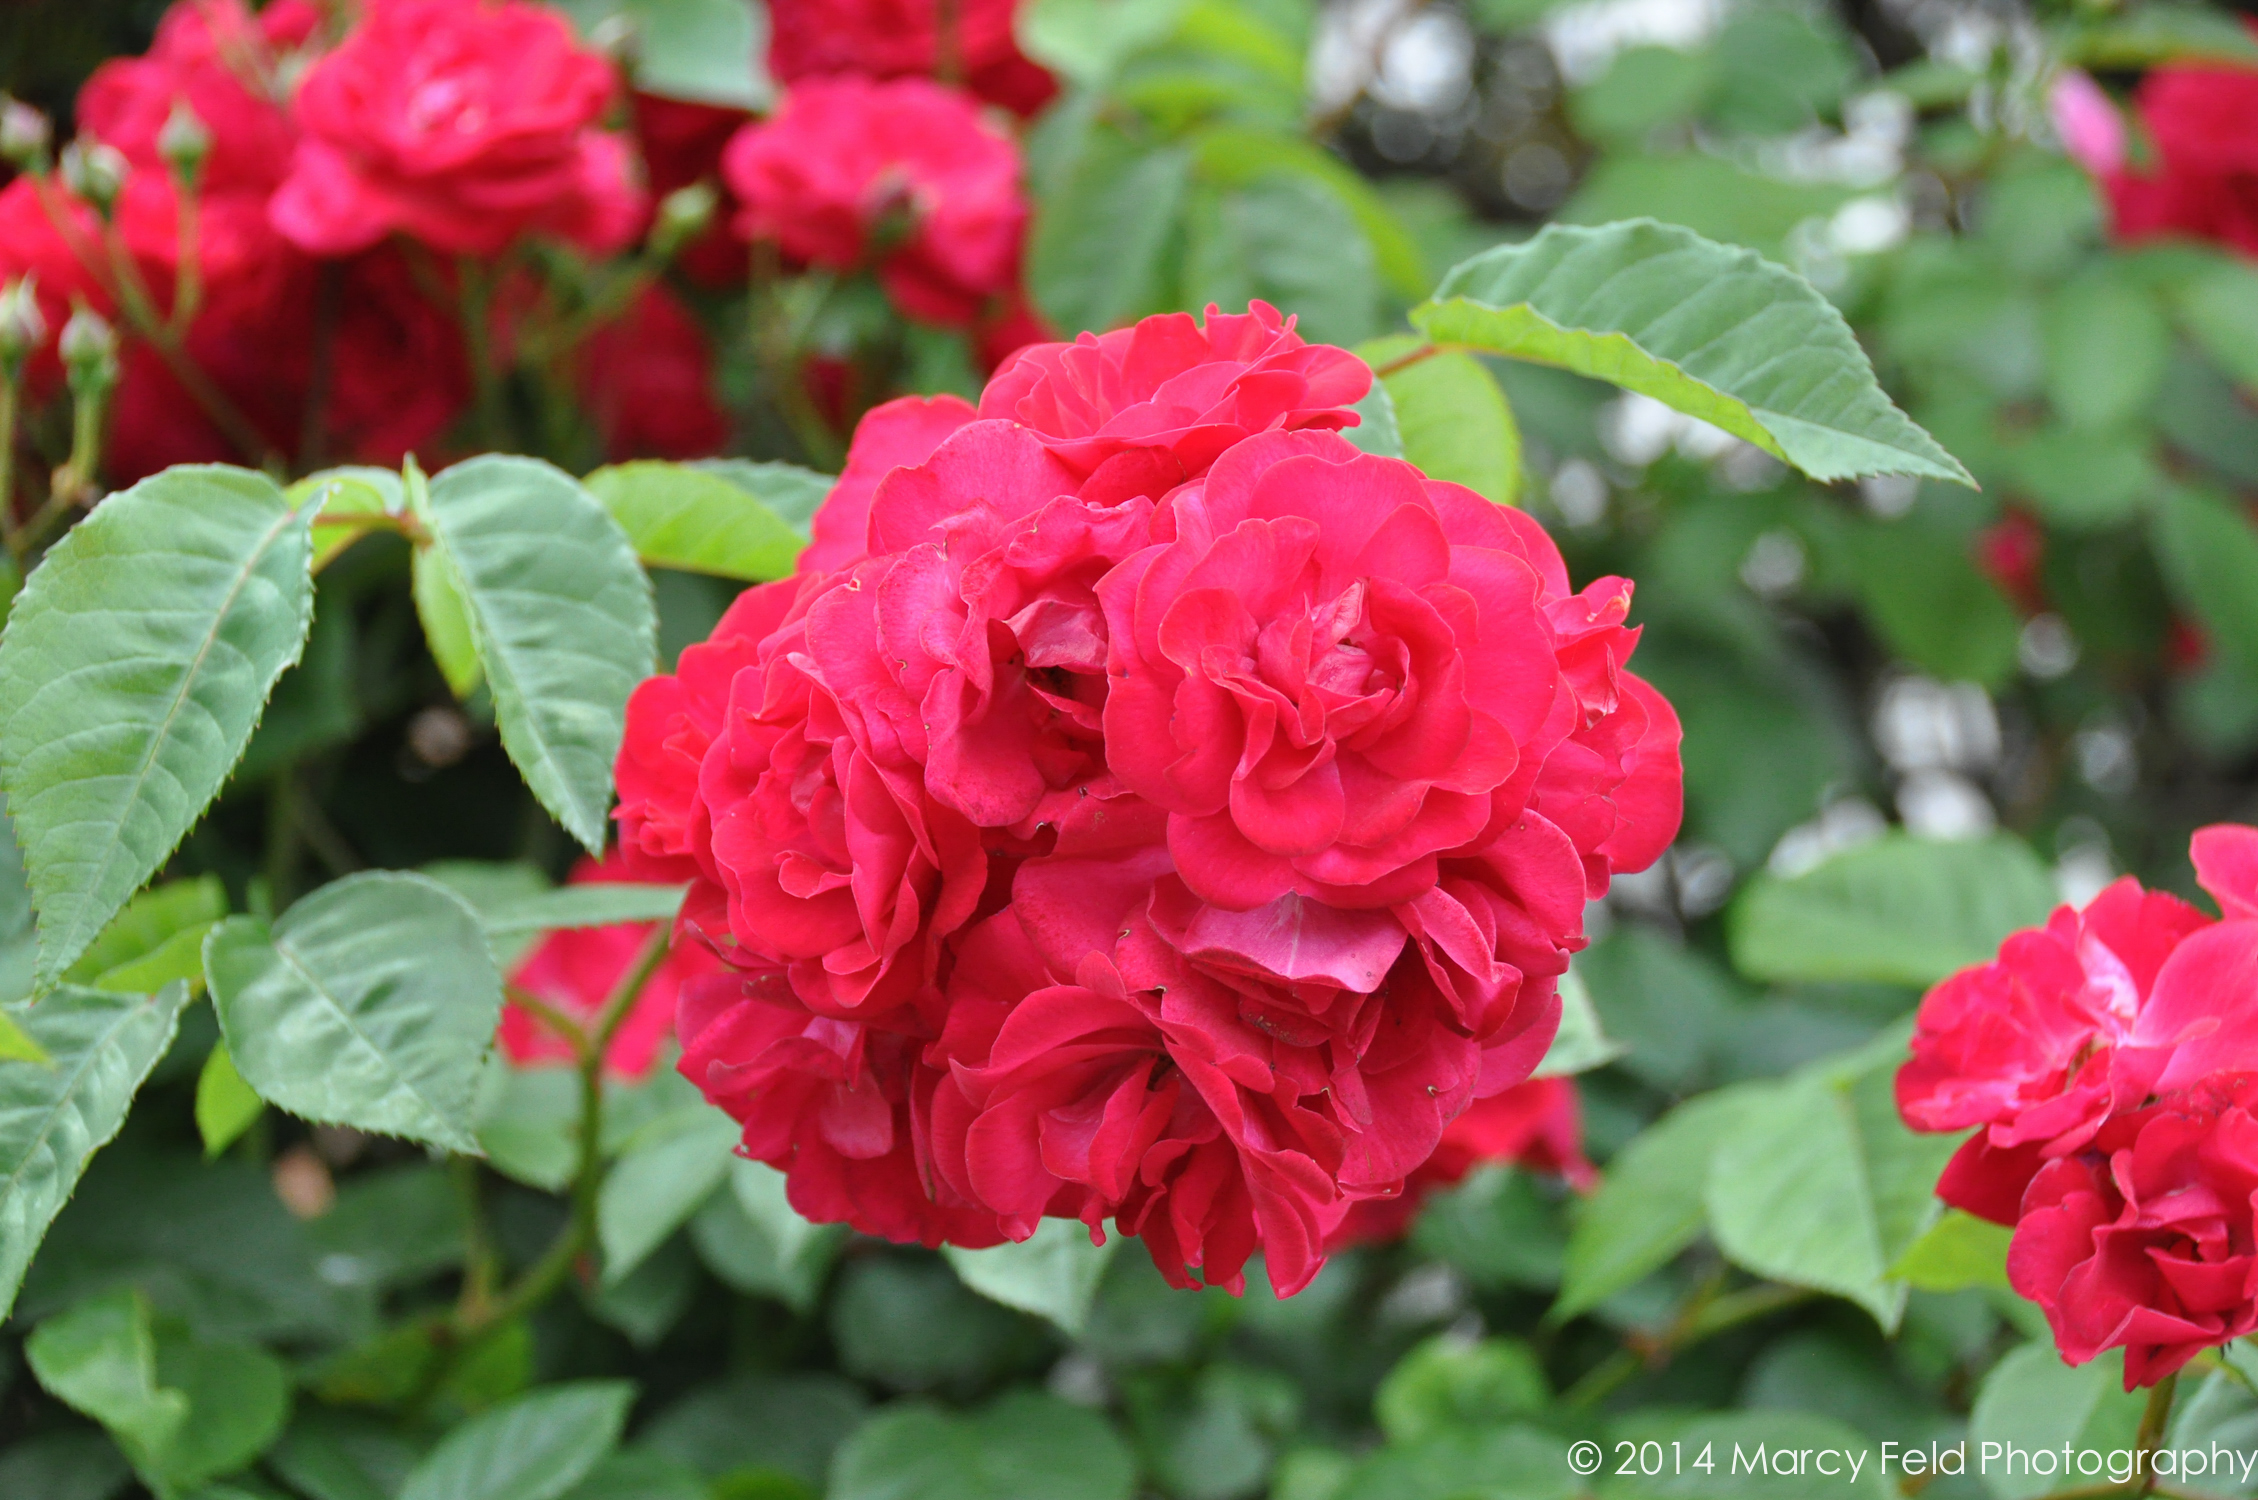 Their Amazing Rose Bush In Full Bloom